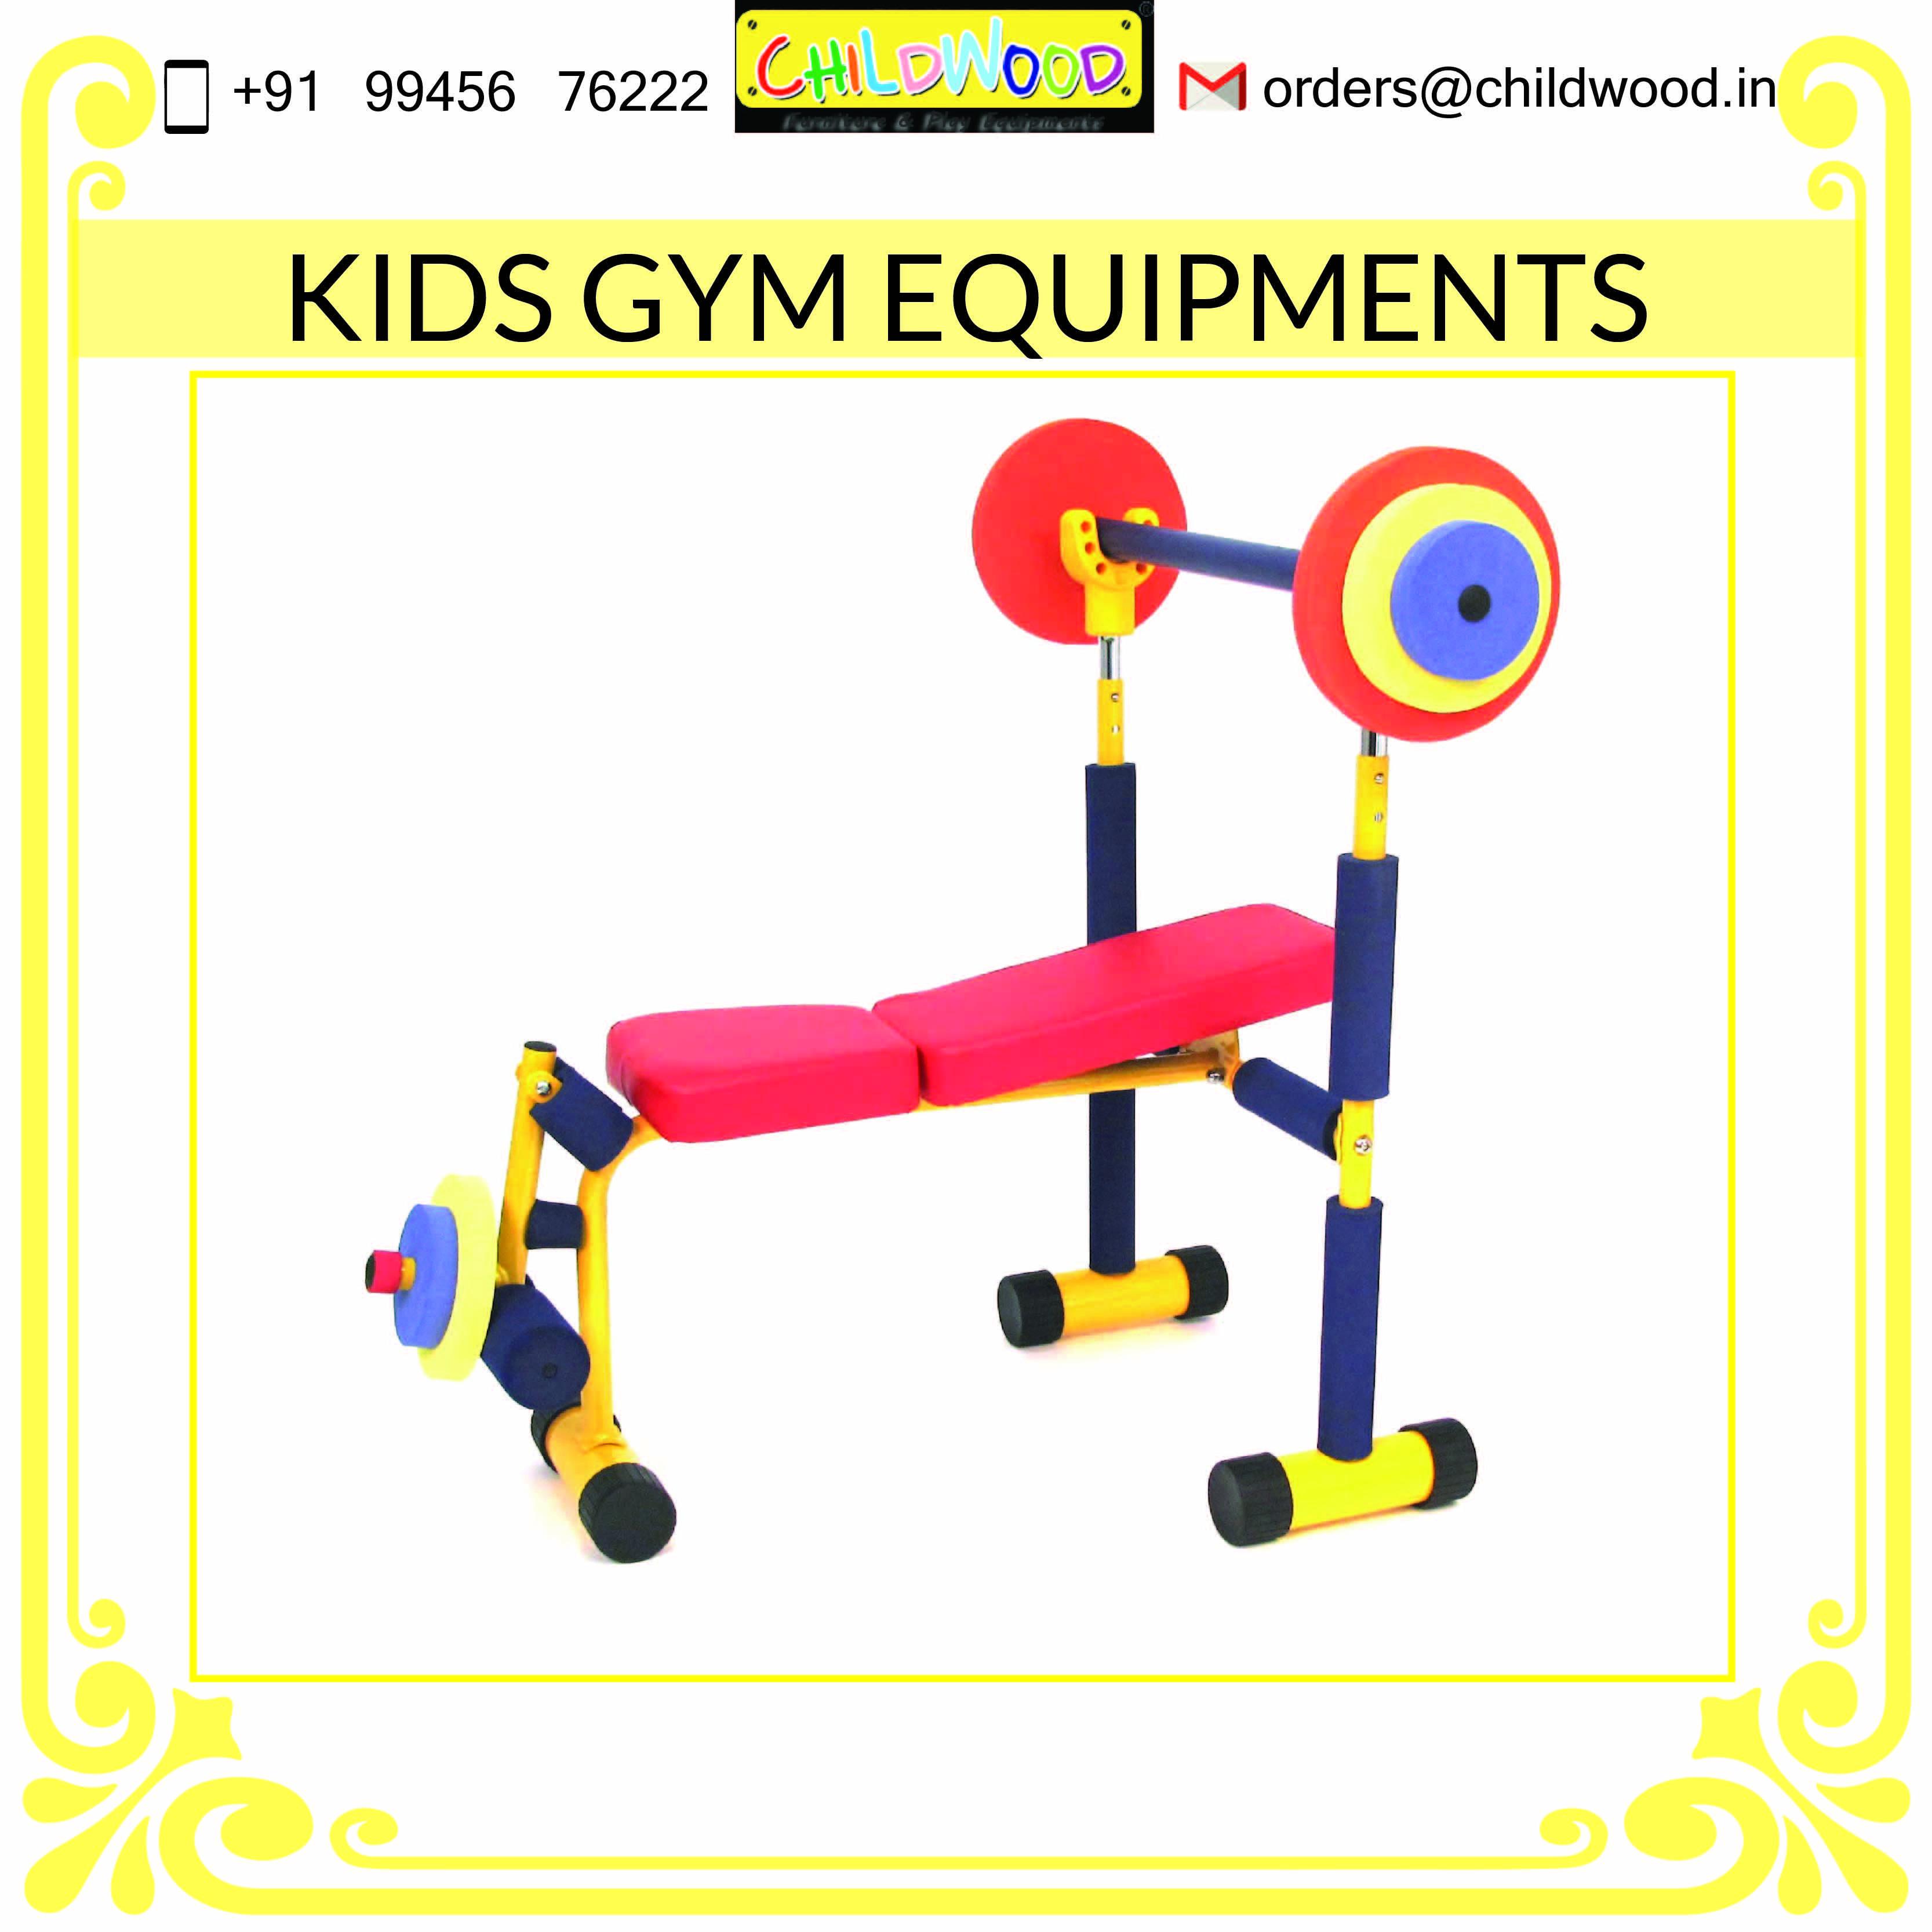 Childwood Kids Gym Equipment Supplier In Bangalore